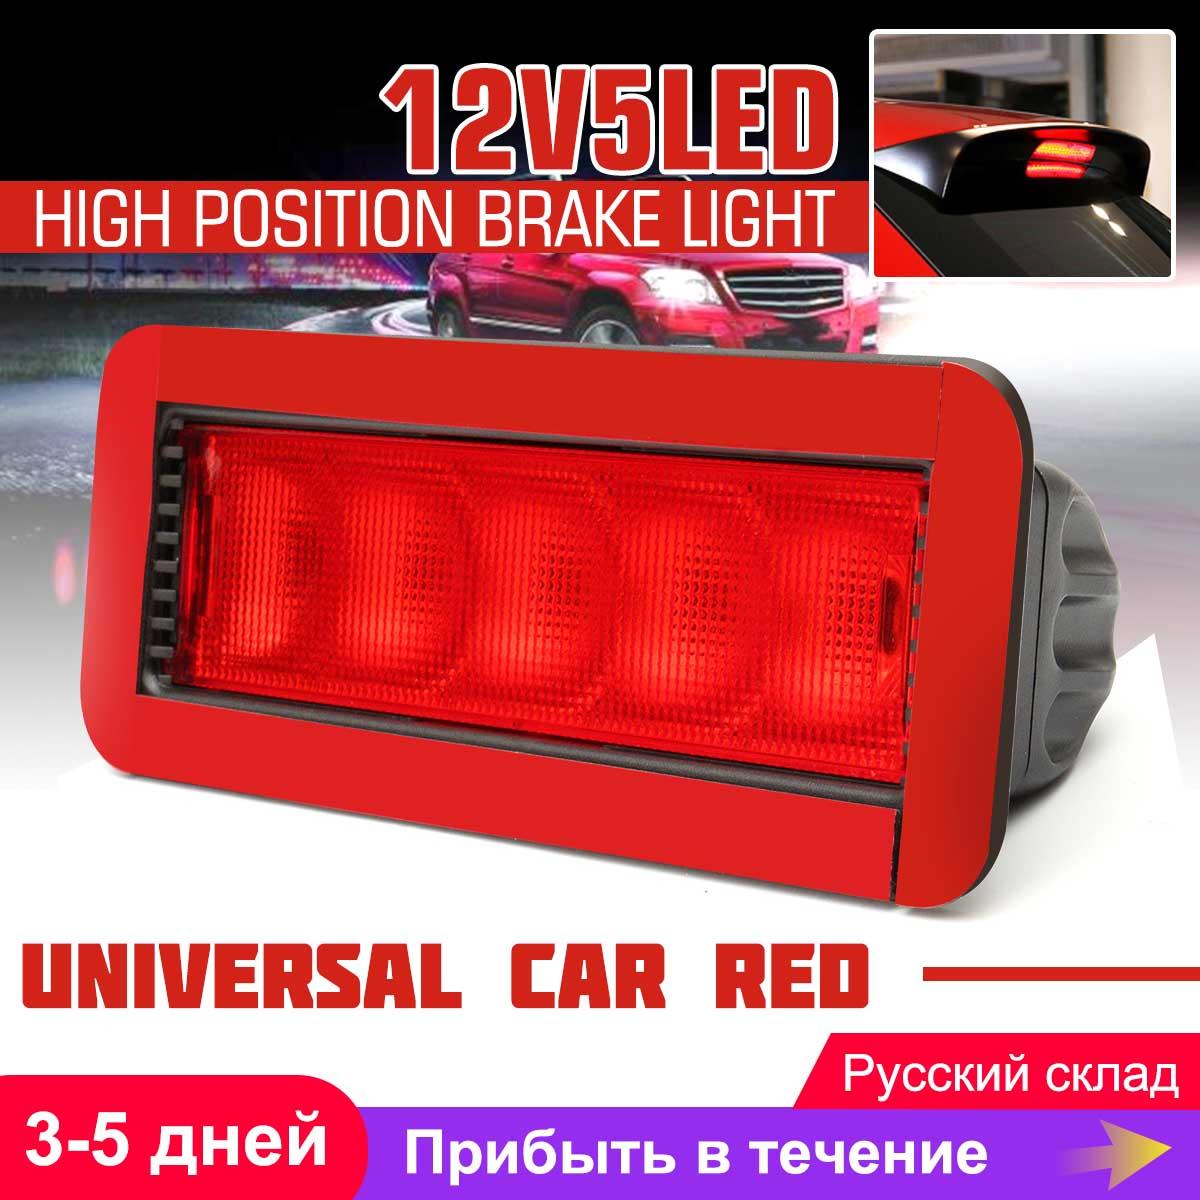 Luz trasera LED Universal para freno, luz roja para coche, 5LED, 12V, de montaje alto palanca trasera, tercera, 3 °, luz LED para coche, plástico de 0,5 W